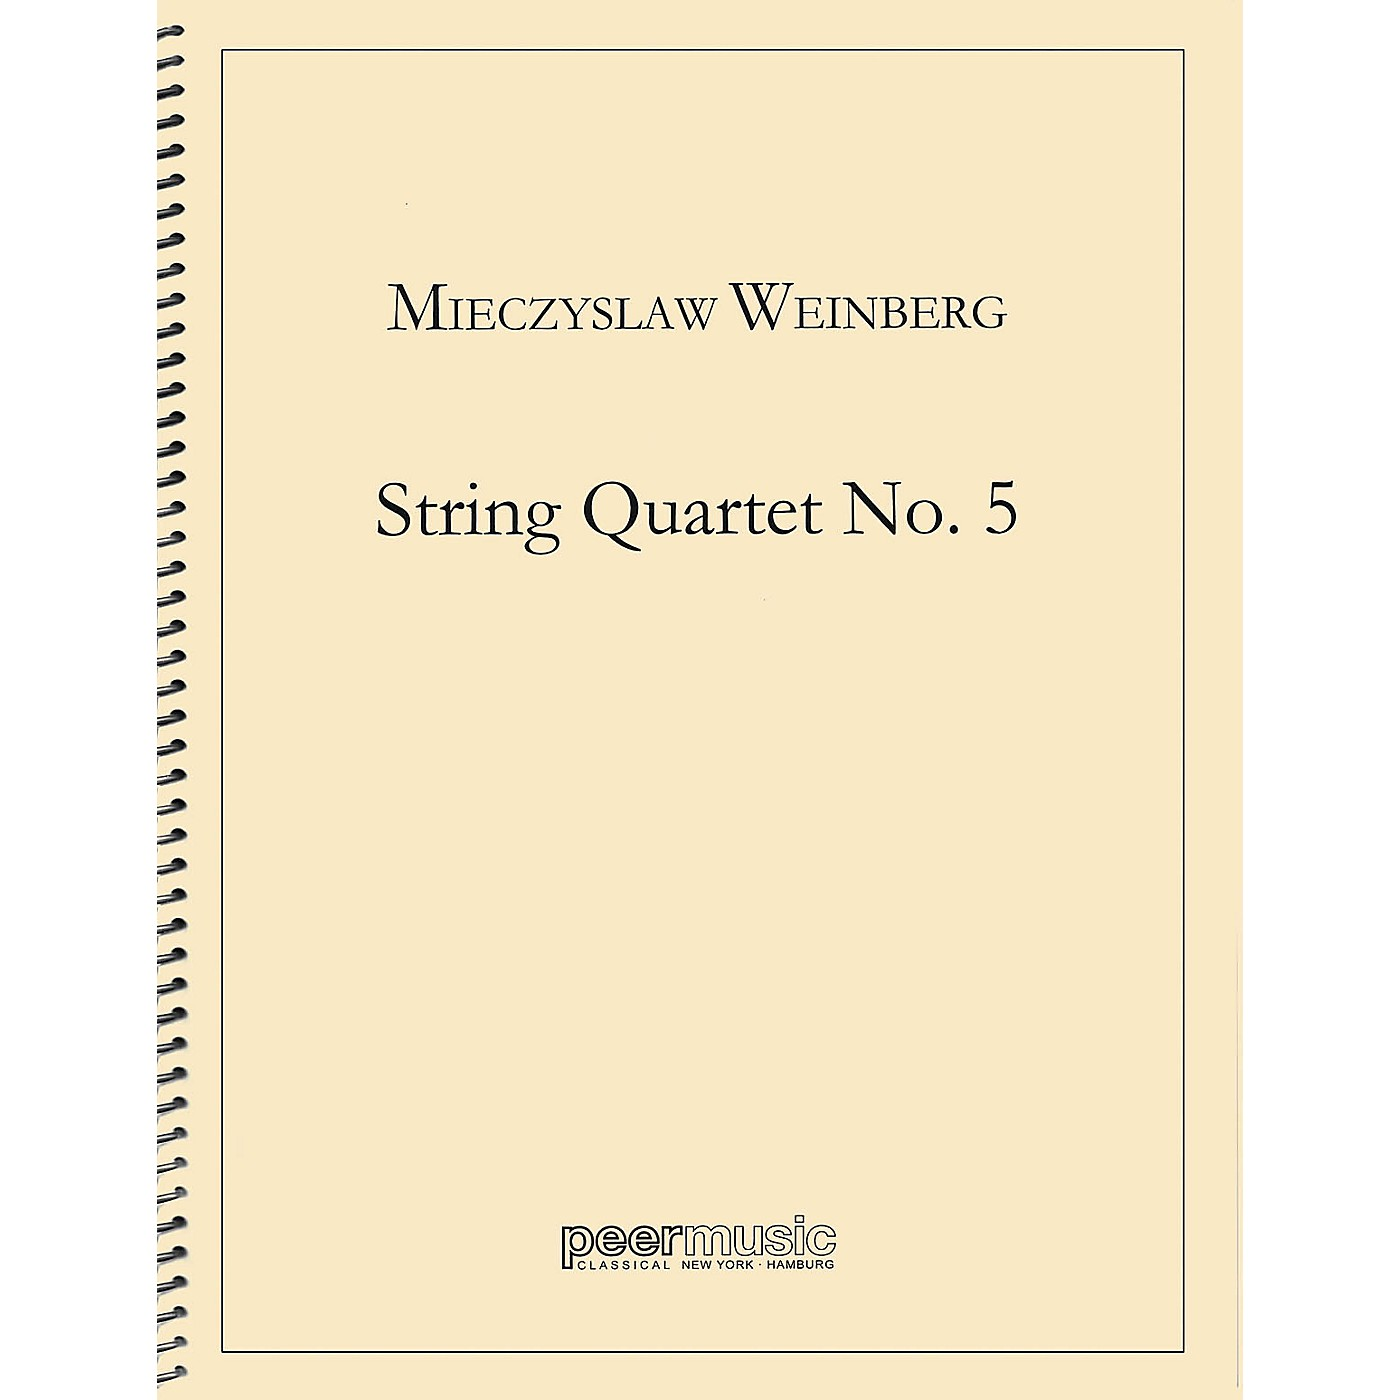 Peer Music String Quartet No. 5 Peermusic Classical Series by Mieczyslaw Weinberg thumbnail